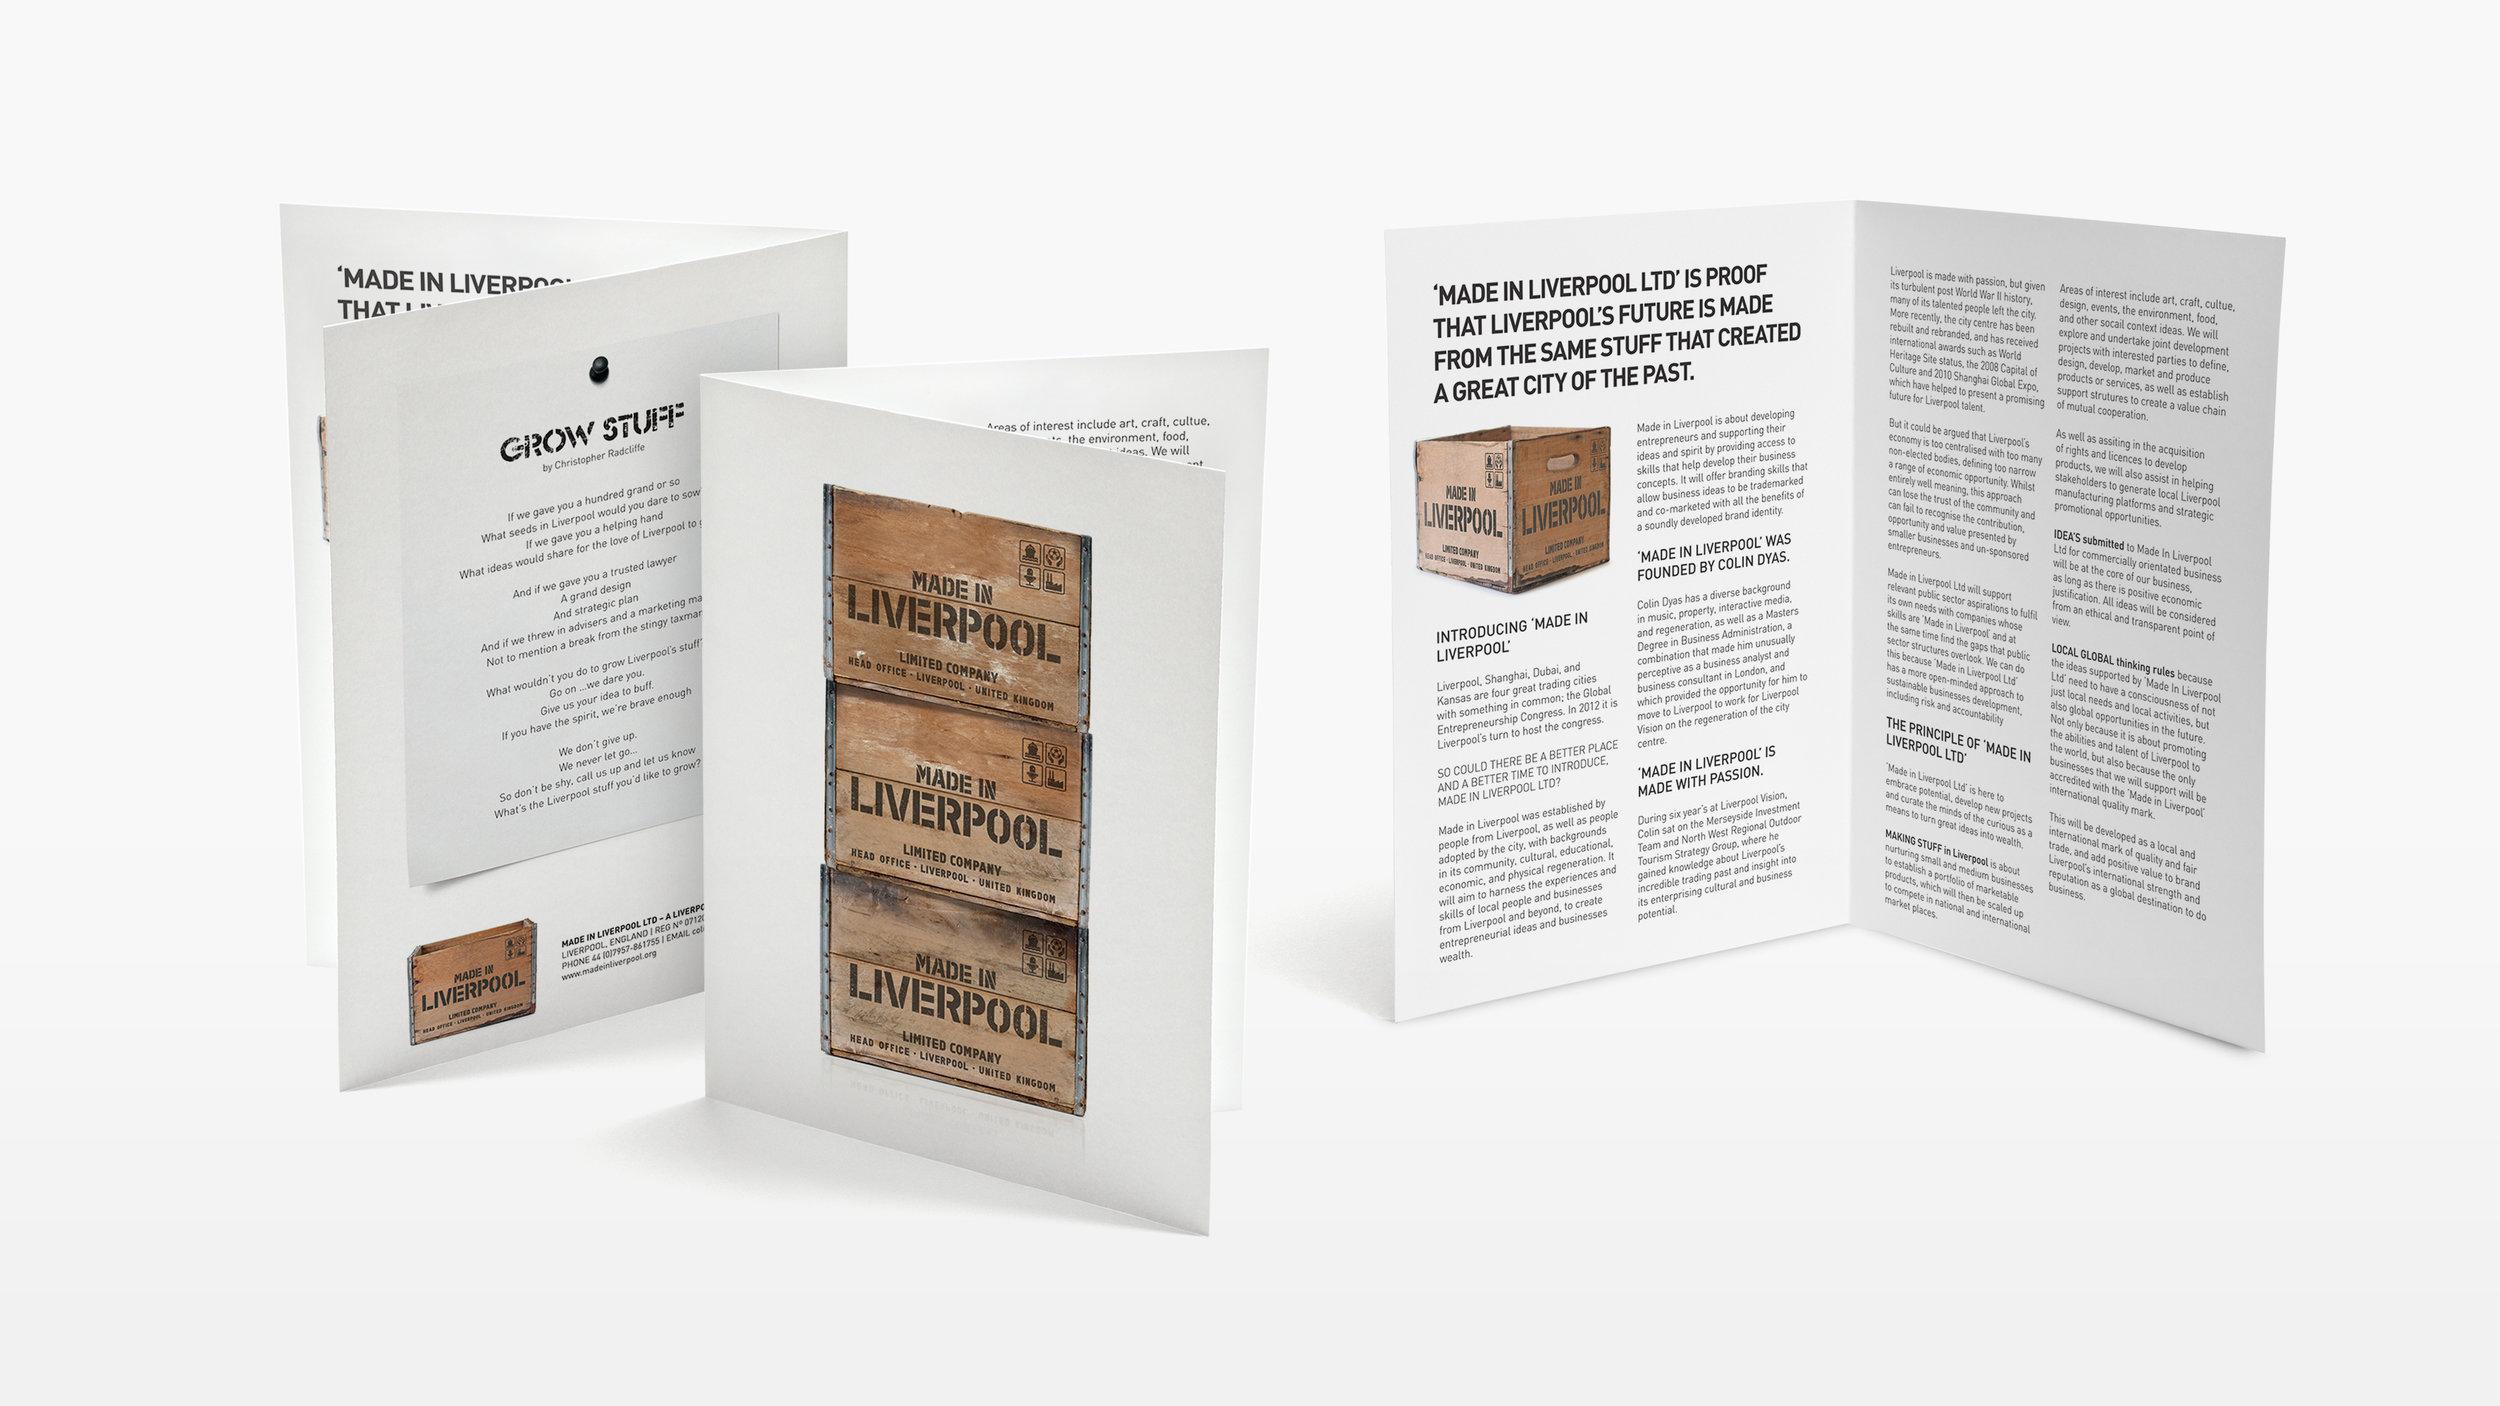 Brand_republica_Made_In_Liverpool_leaflet_design.jpg